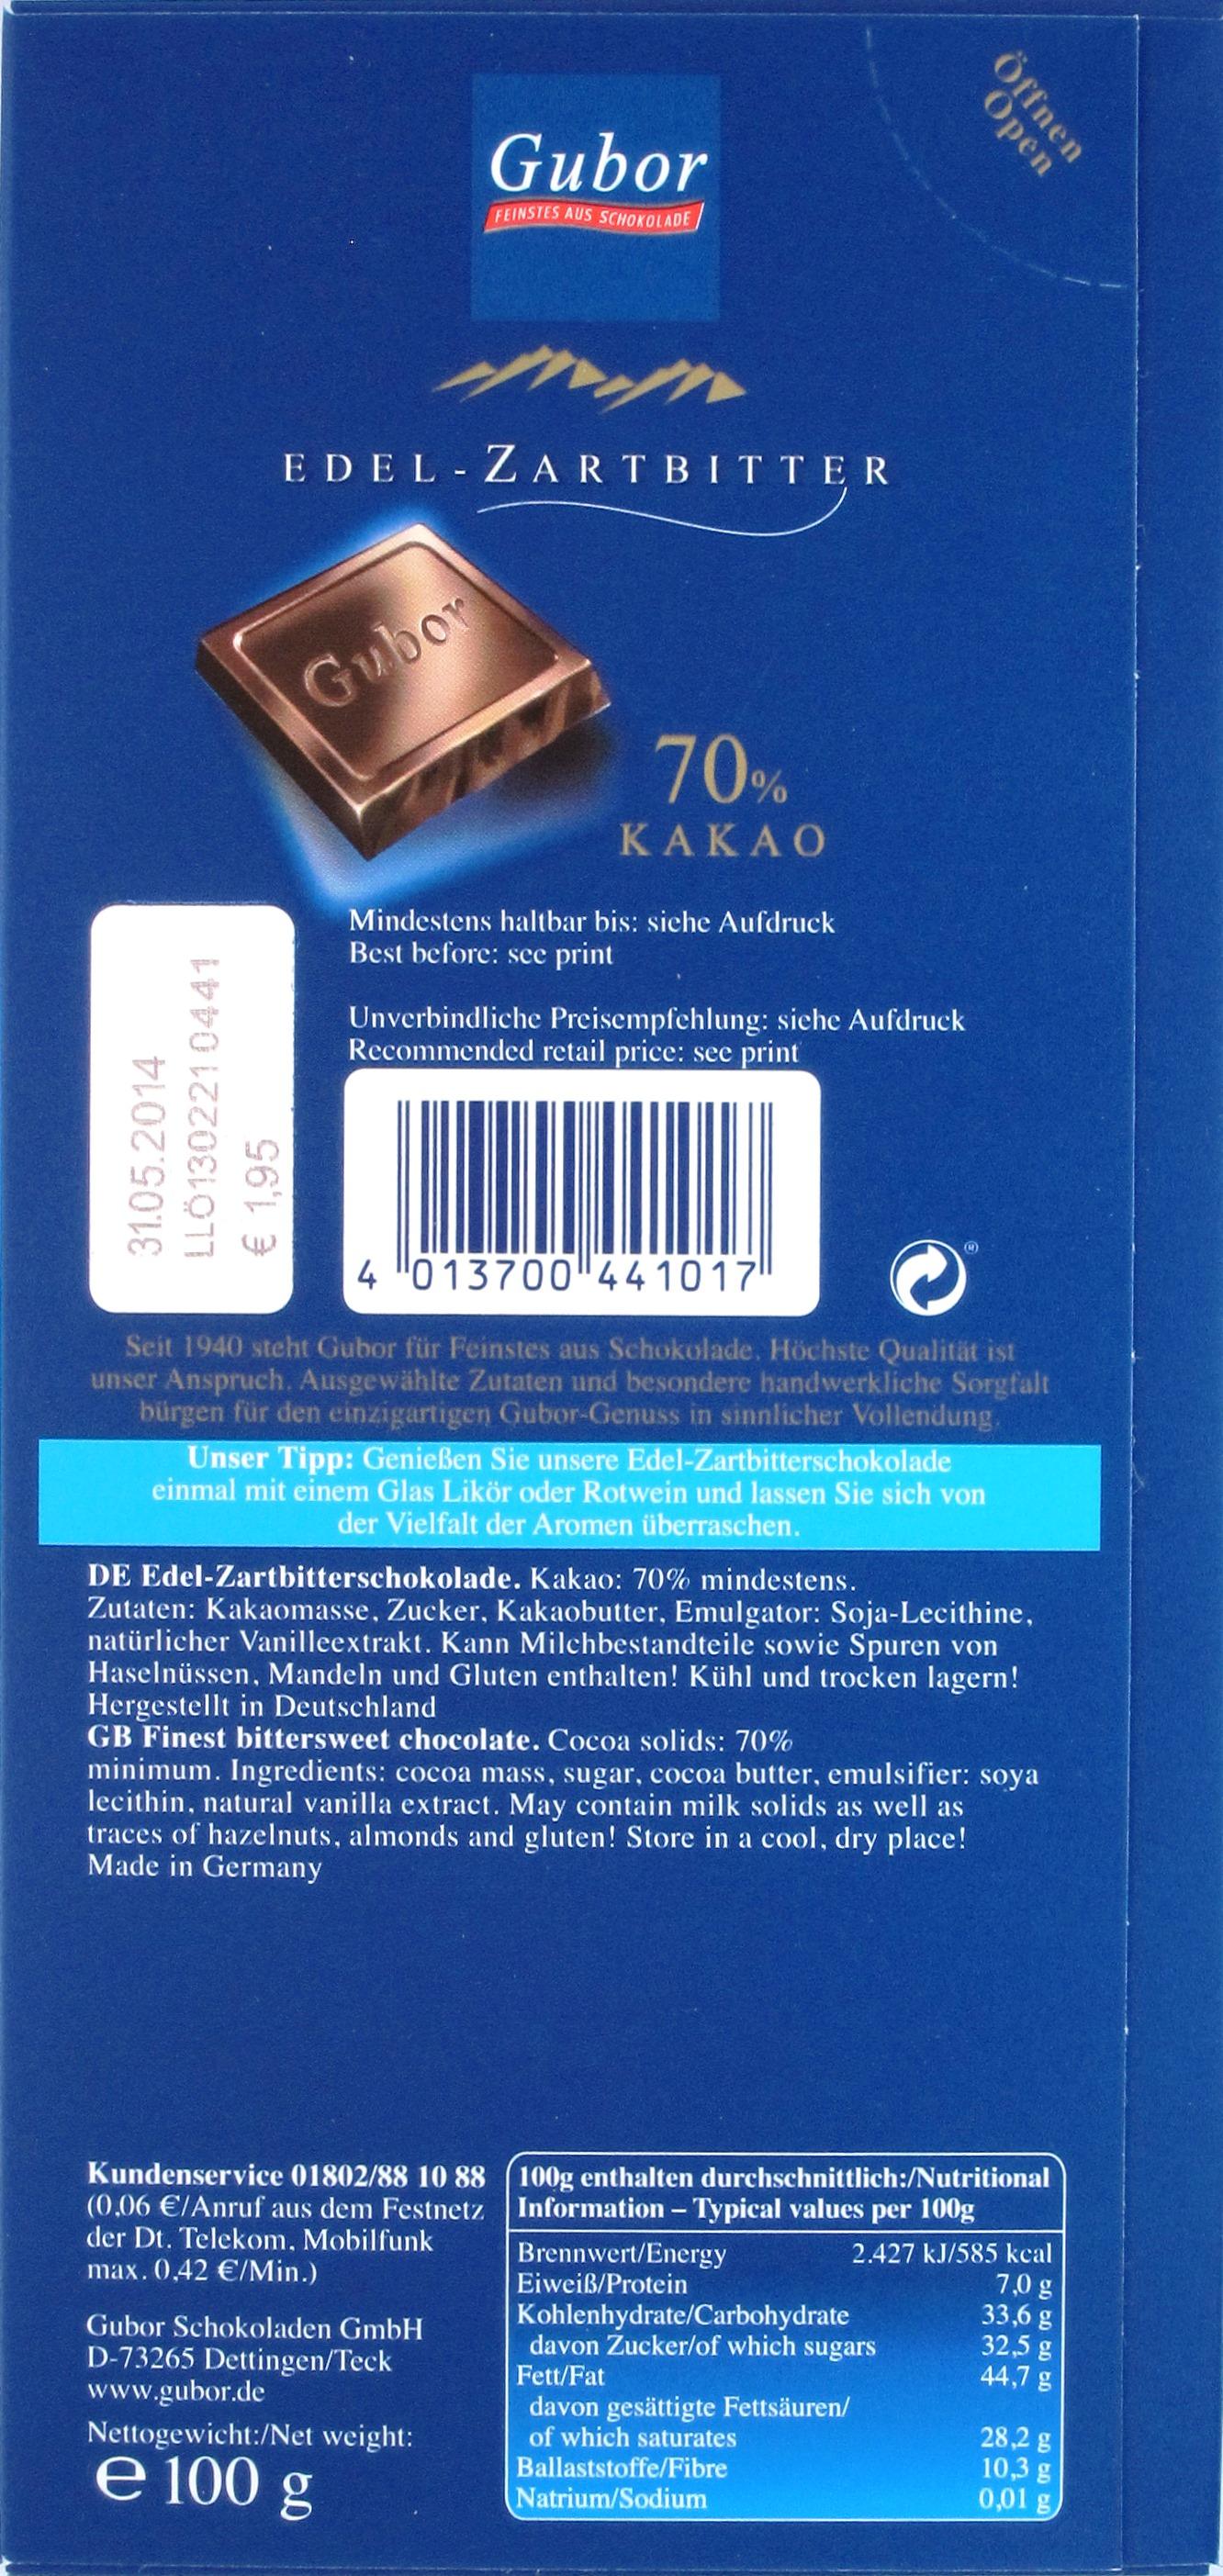 Gubor Zartbitterschokolade, Rückseite